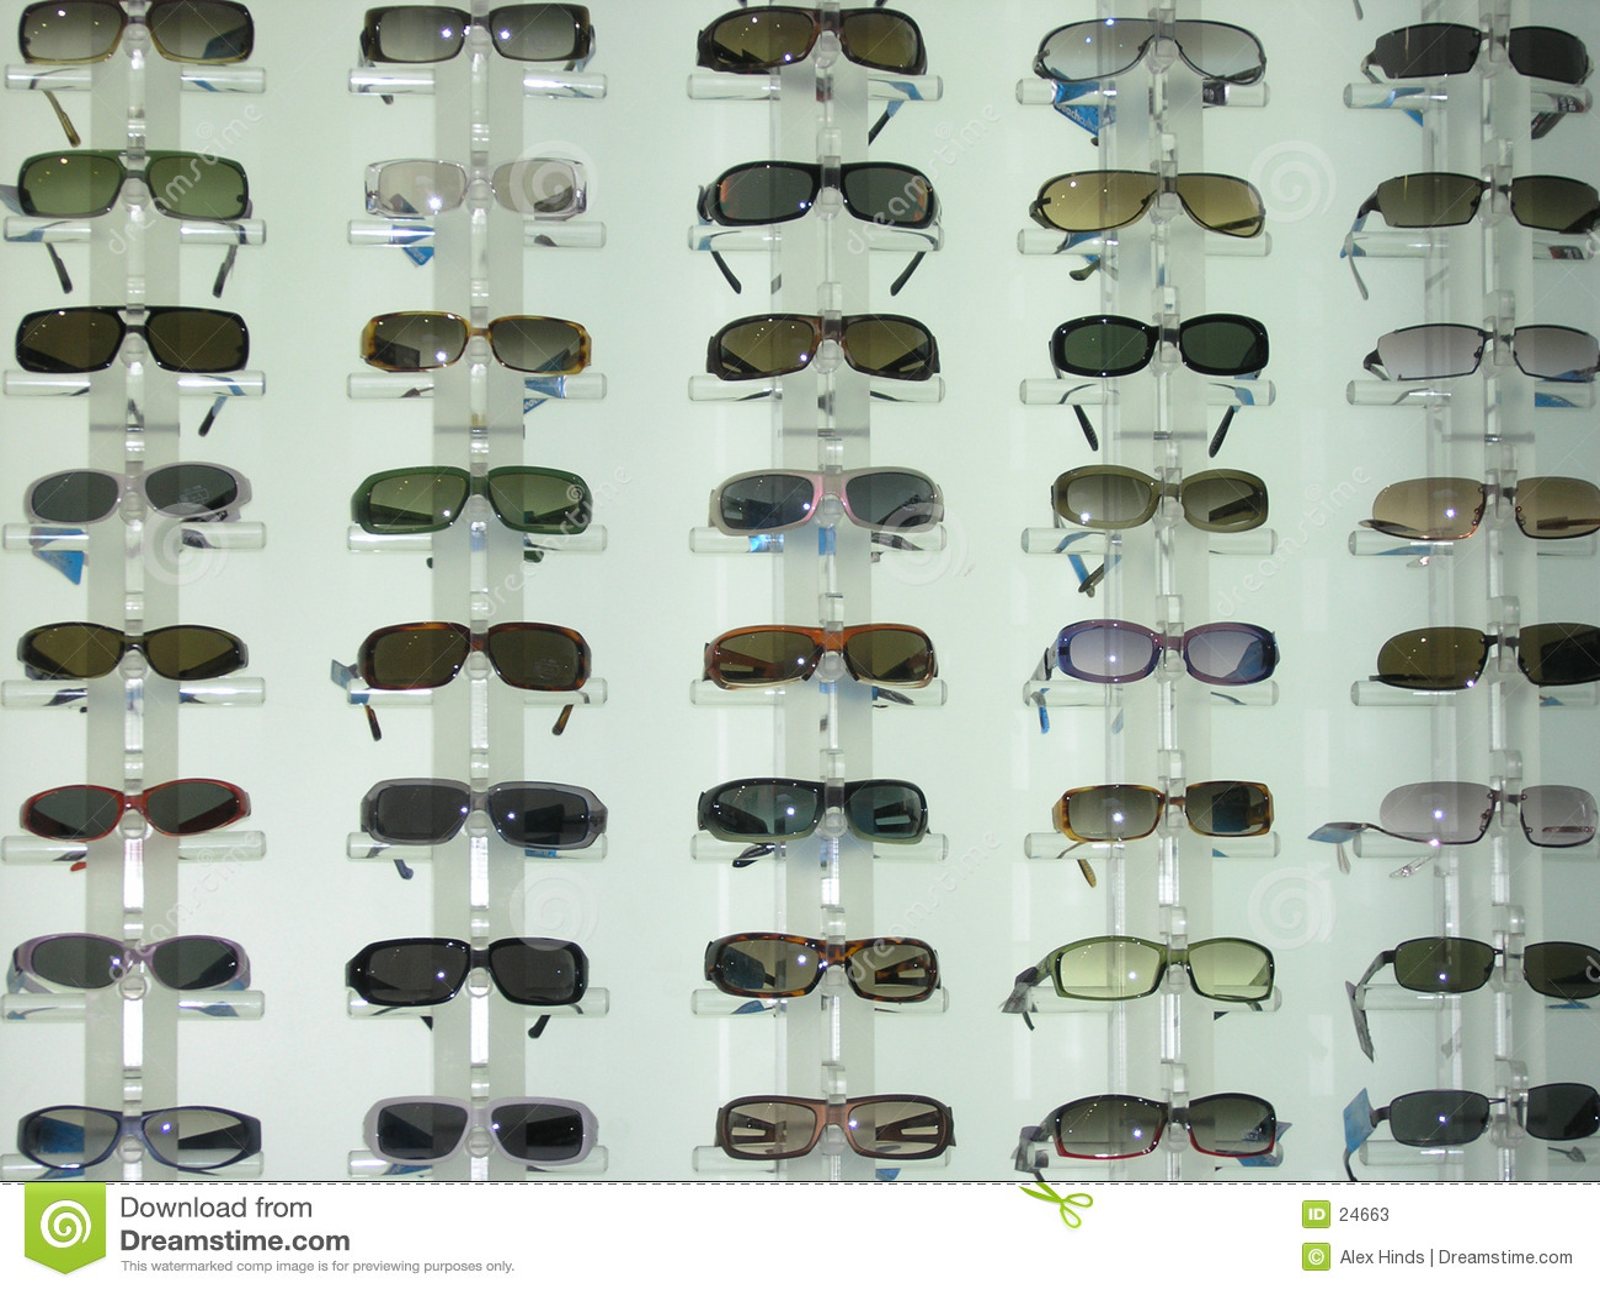 Display sunglasses